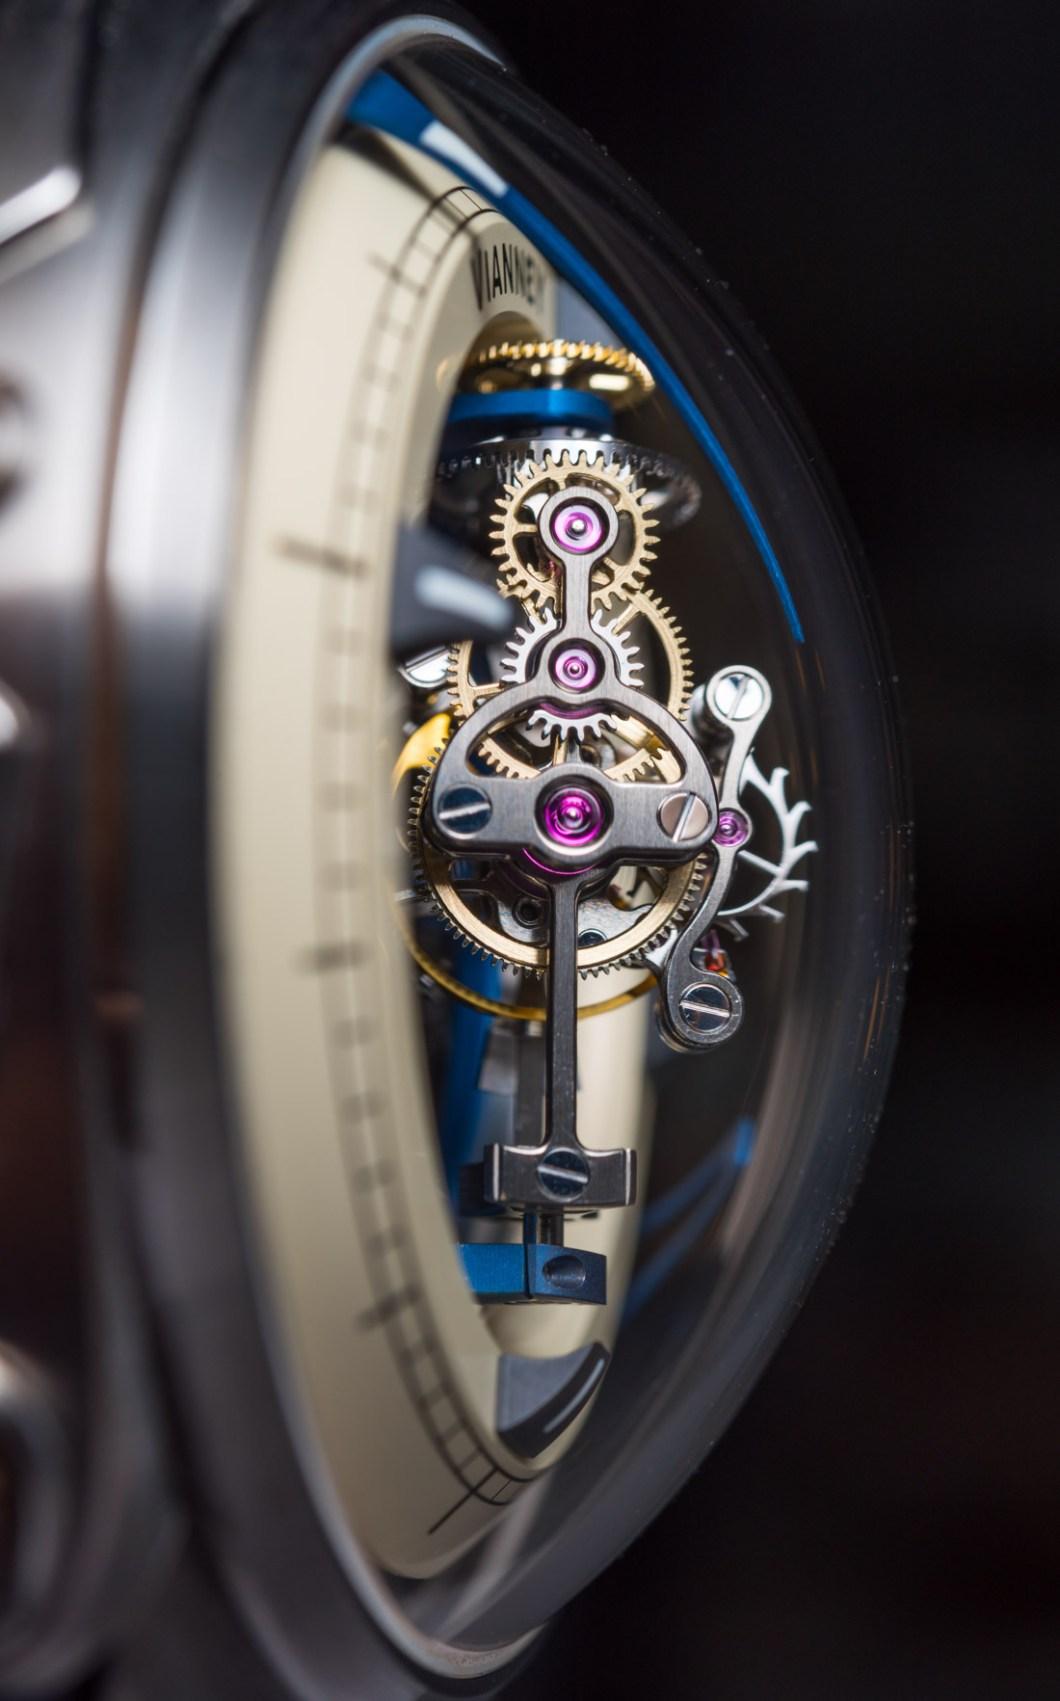 Vianney Halter Deep Space Tourbillon Watch Hands-On Hands-On